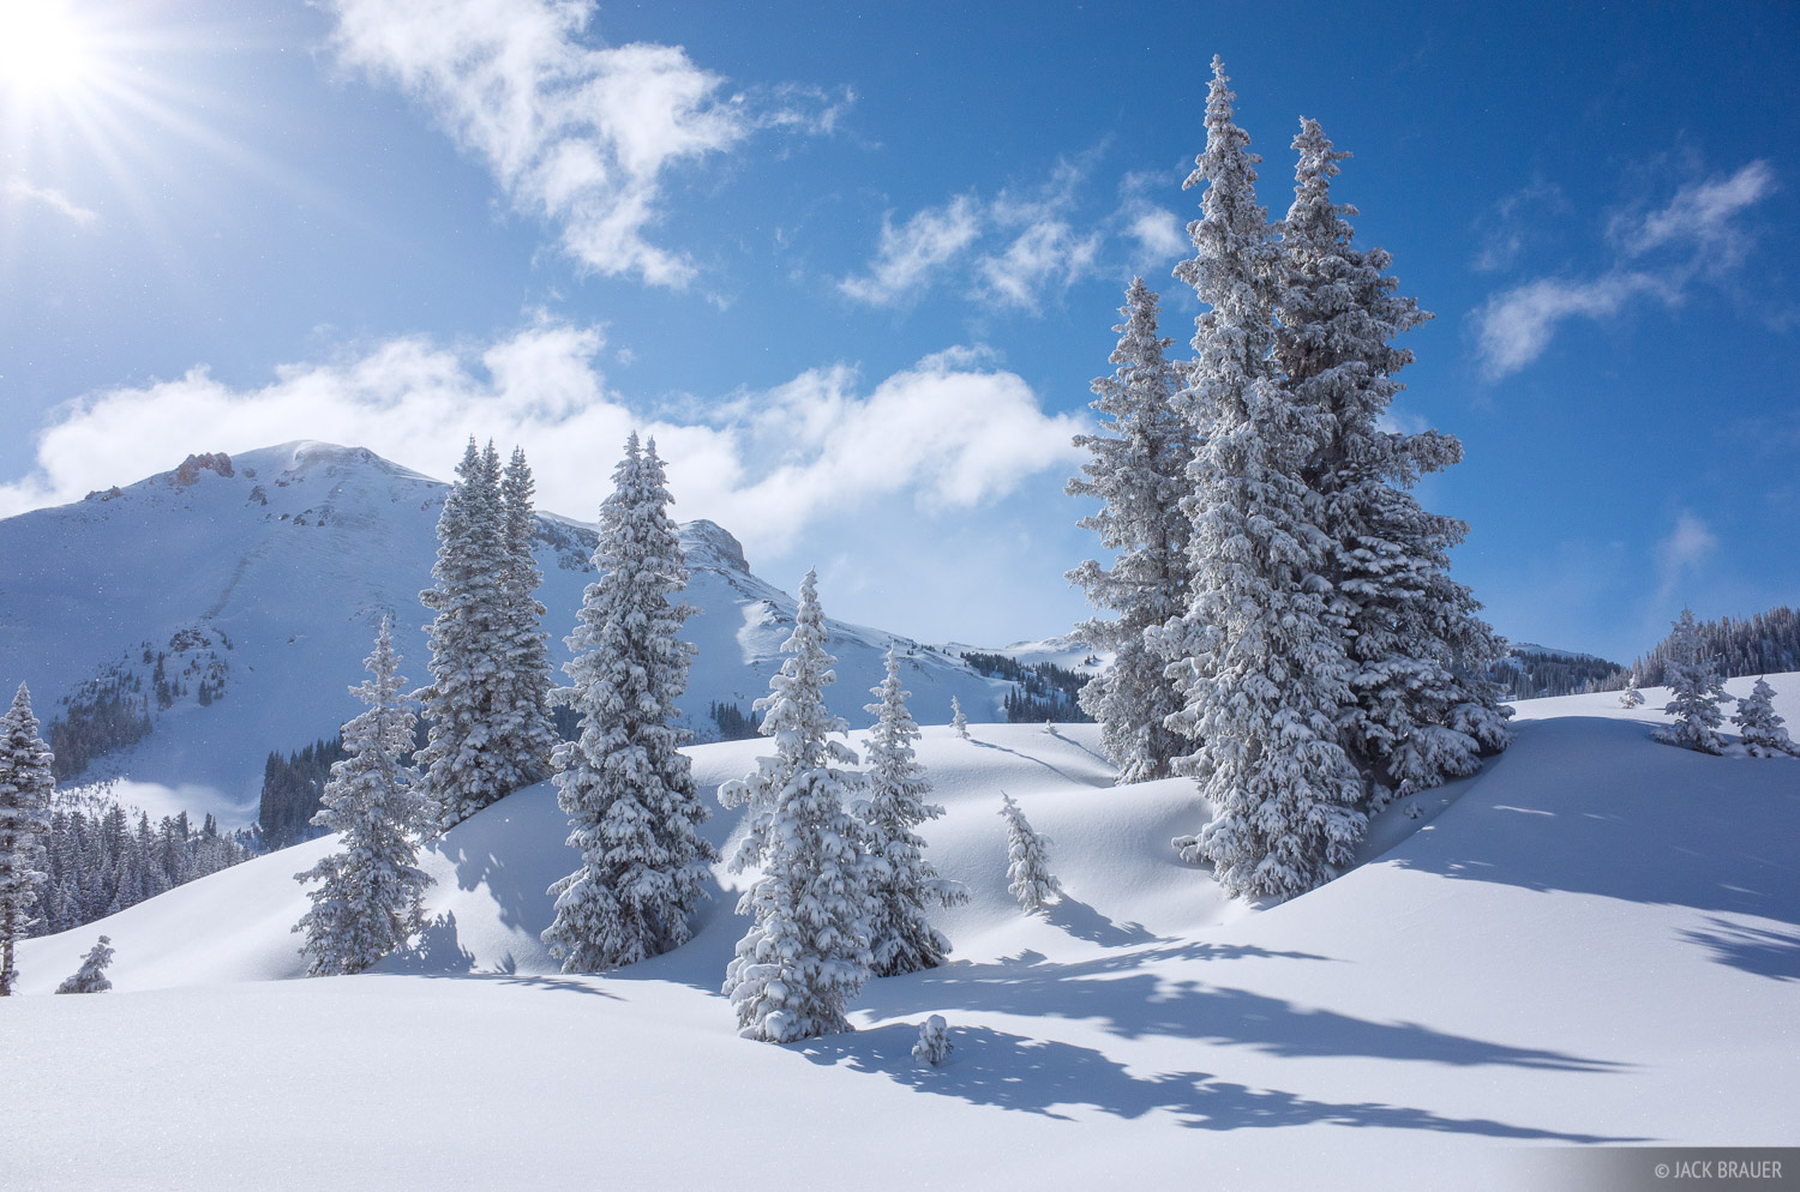 Colorado,Red Mountain Pass,San Juan Mountains, snowy, trees, photo